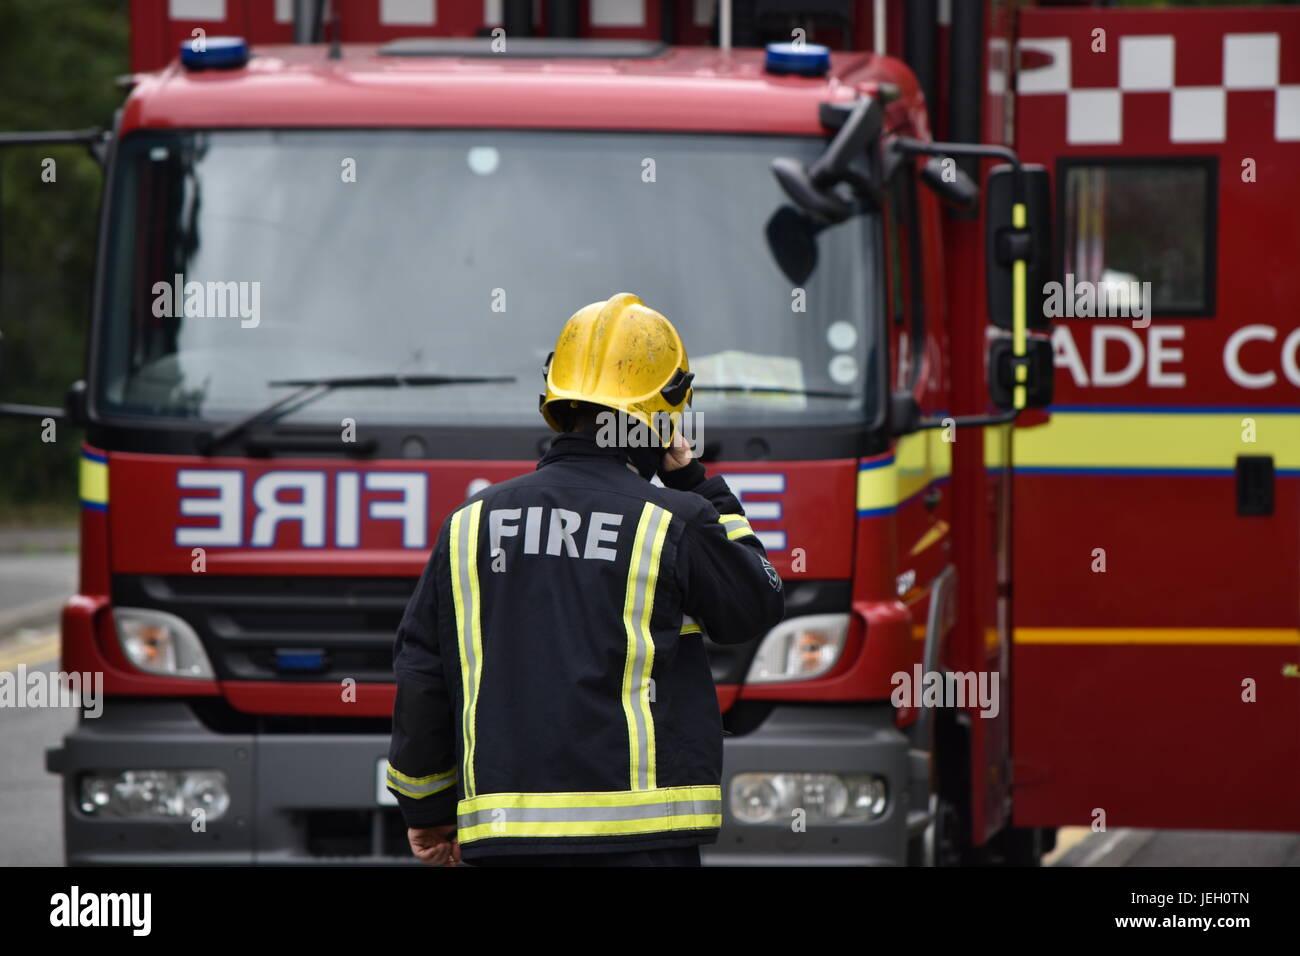 London Fire Brigade Firefighter Walking Towards a Fire Appliance - Stock Image